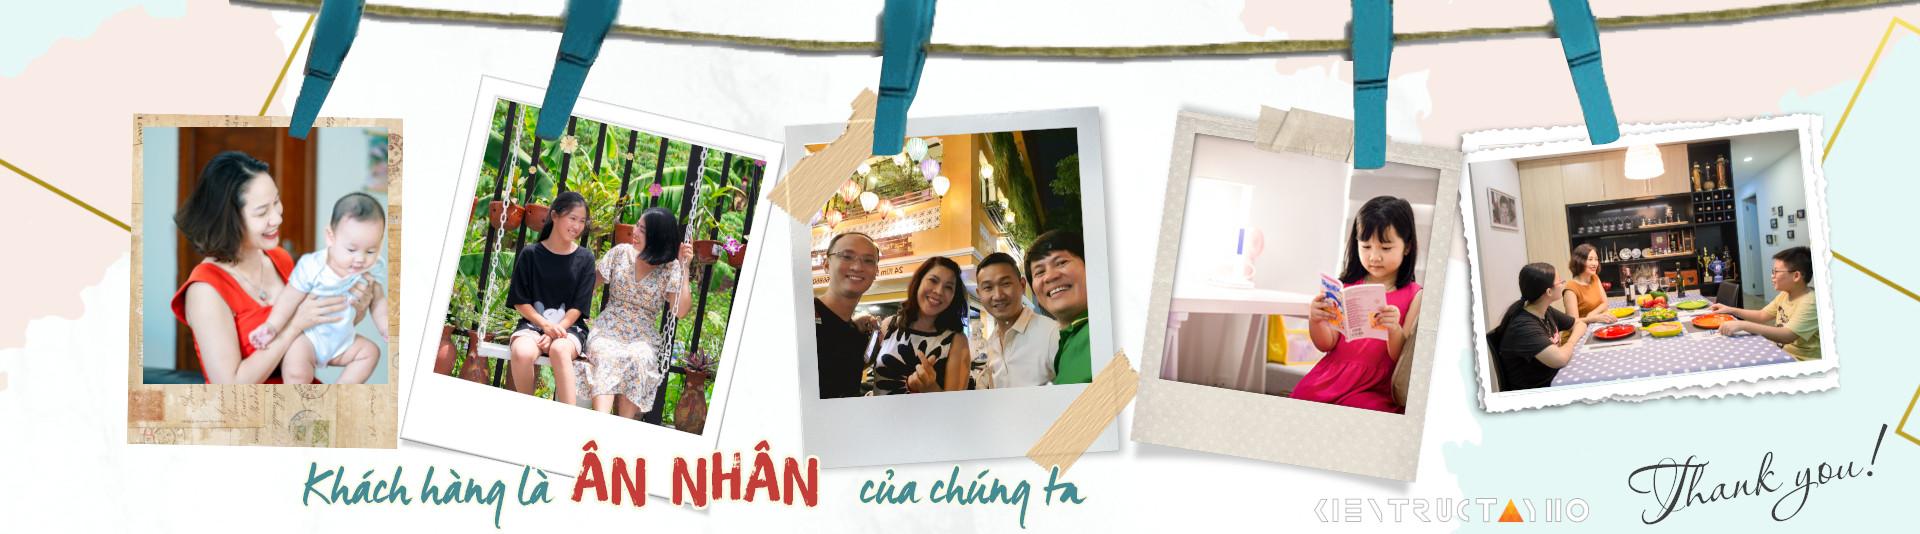 khach-hang-la-an-nhan